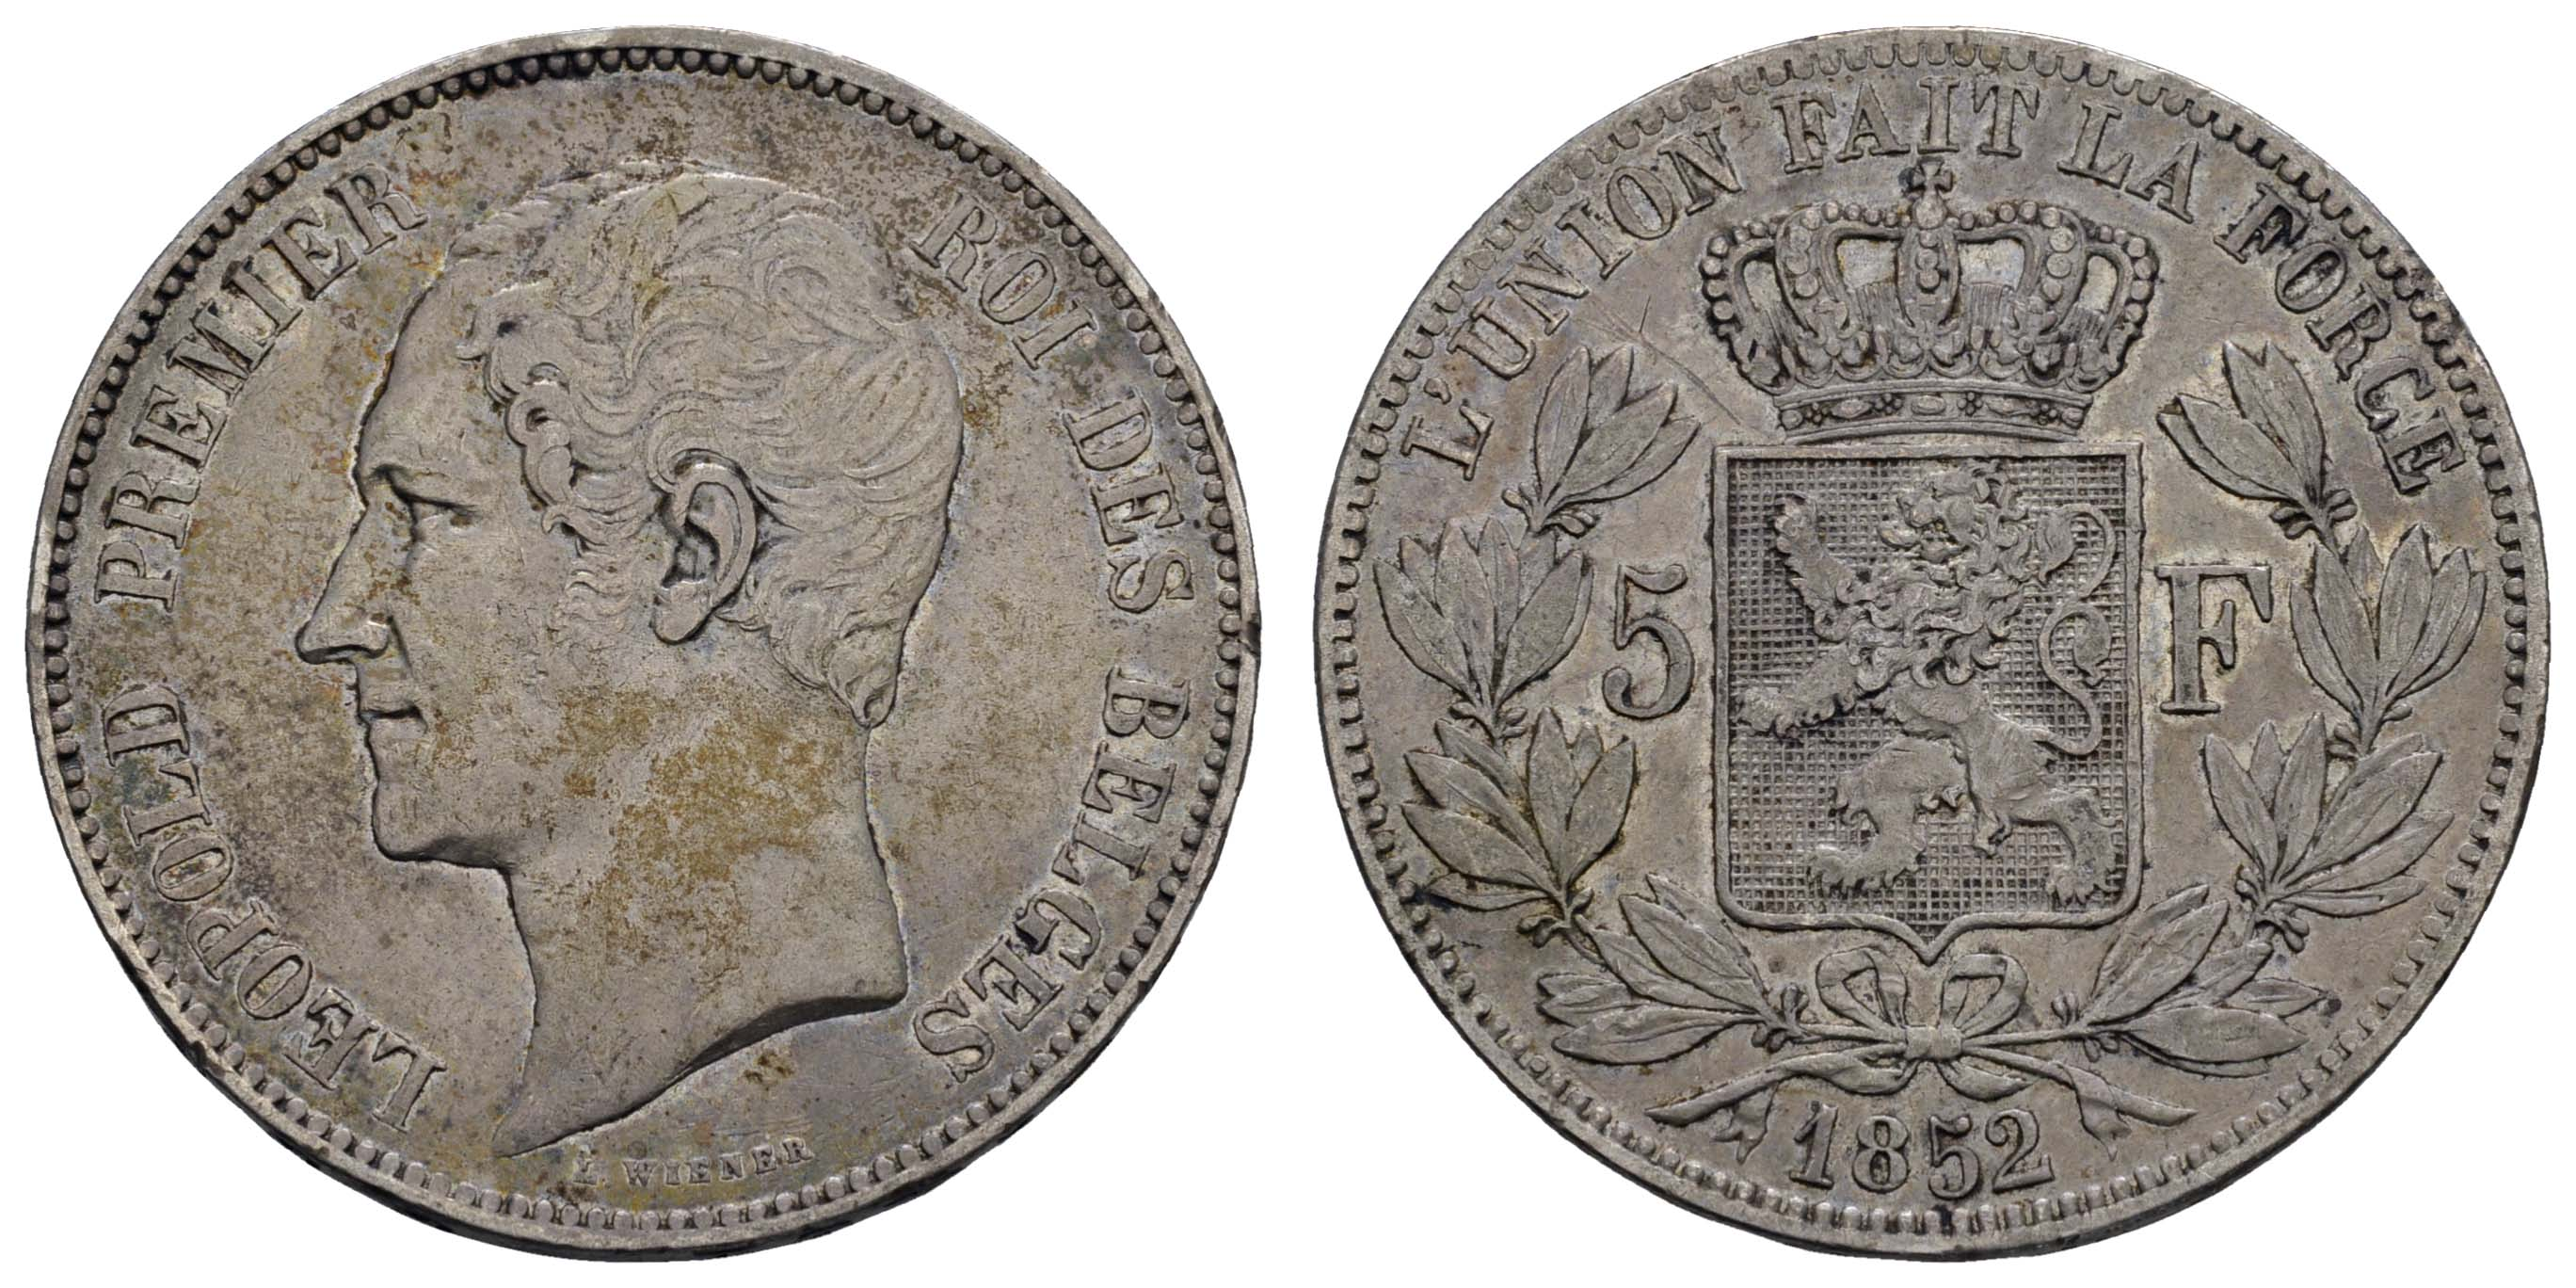 Lot 1447 - europa ab 1800 - Belgien -  Auktionshaus Ulrich Felzmann GmbH & Co. KG Coins single lots